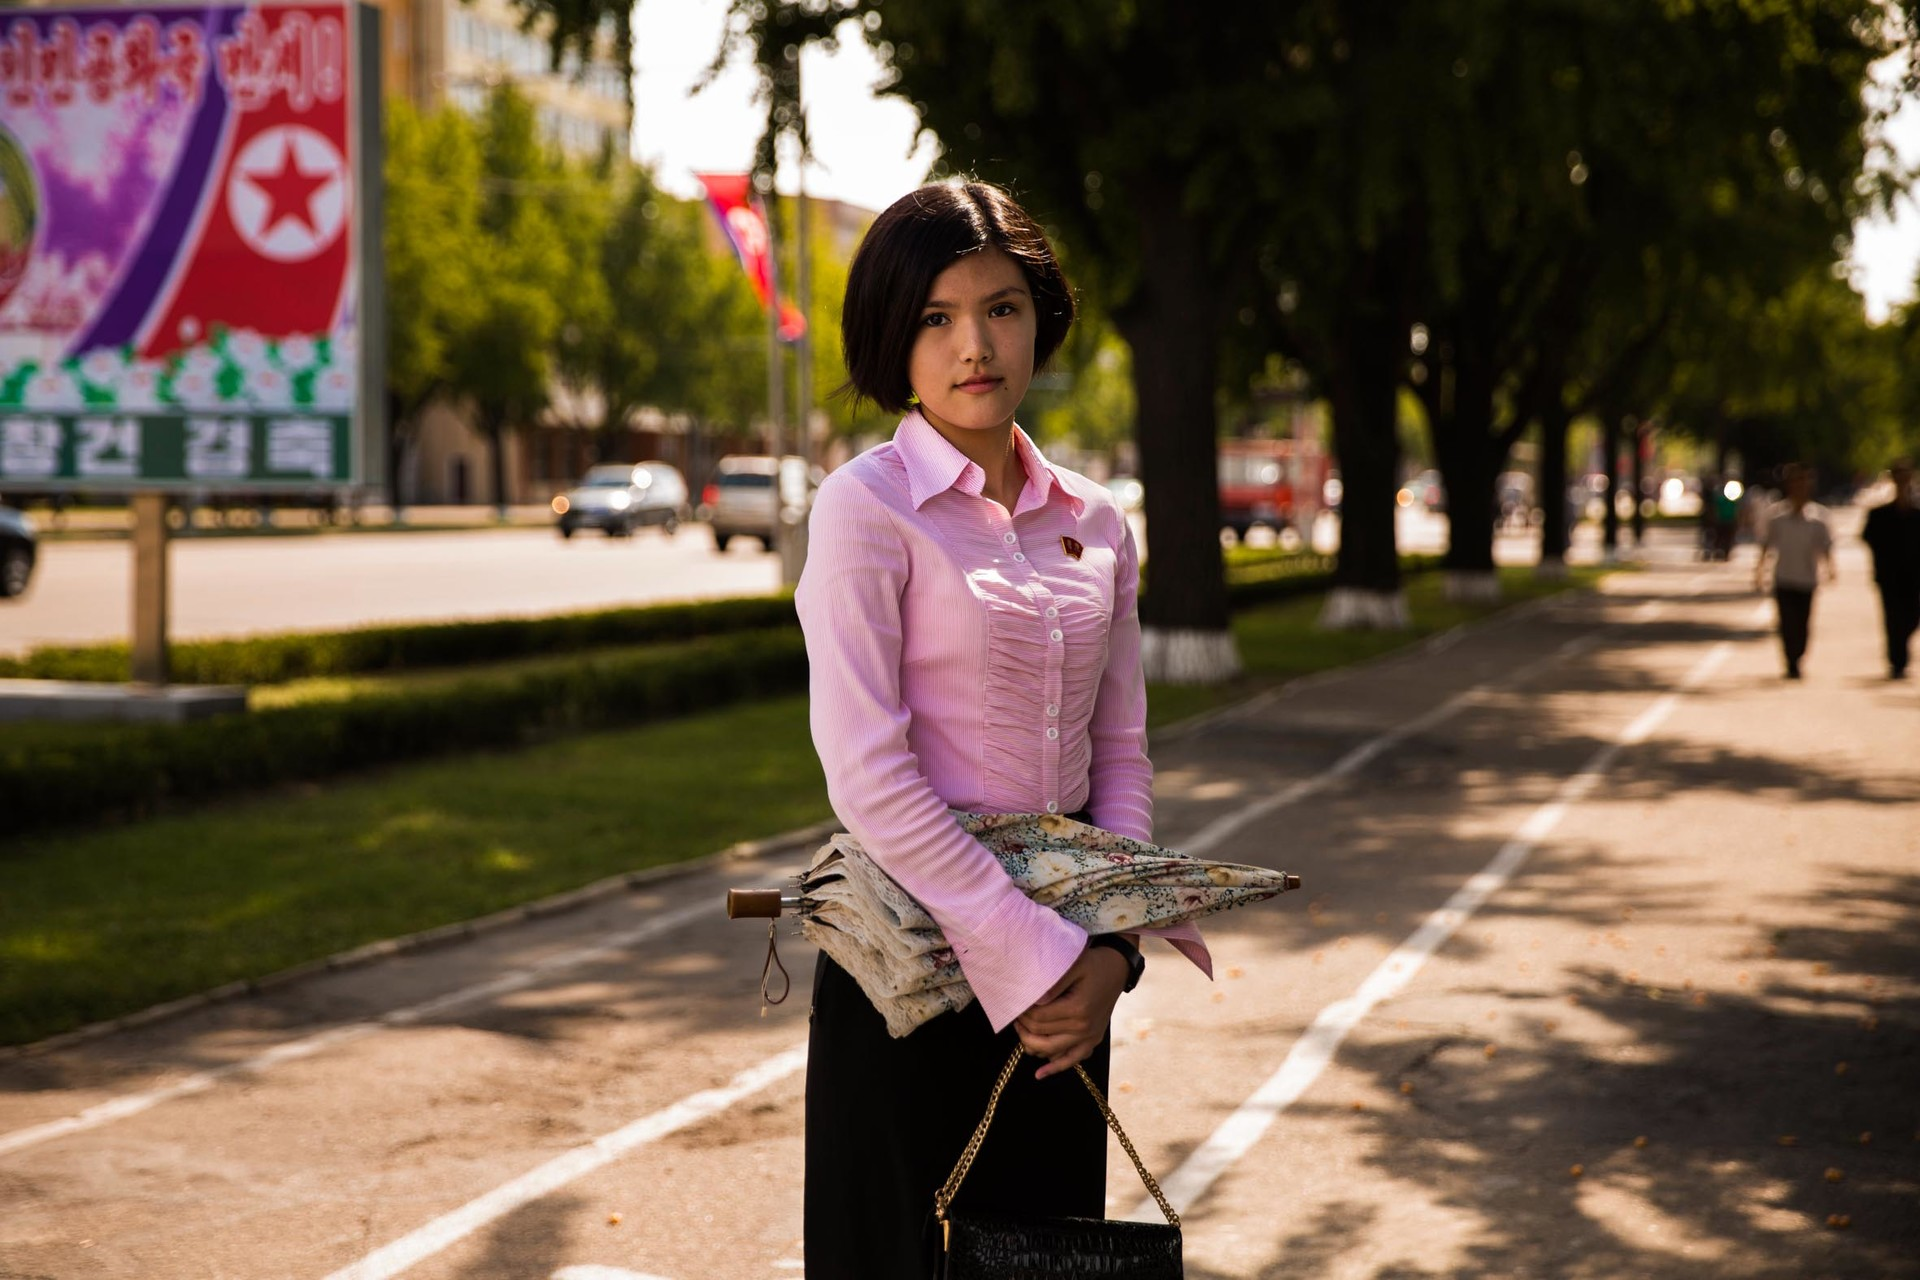 prostitutas en corea del norte webs prostitutas